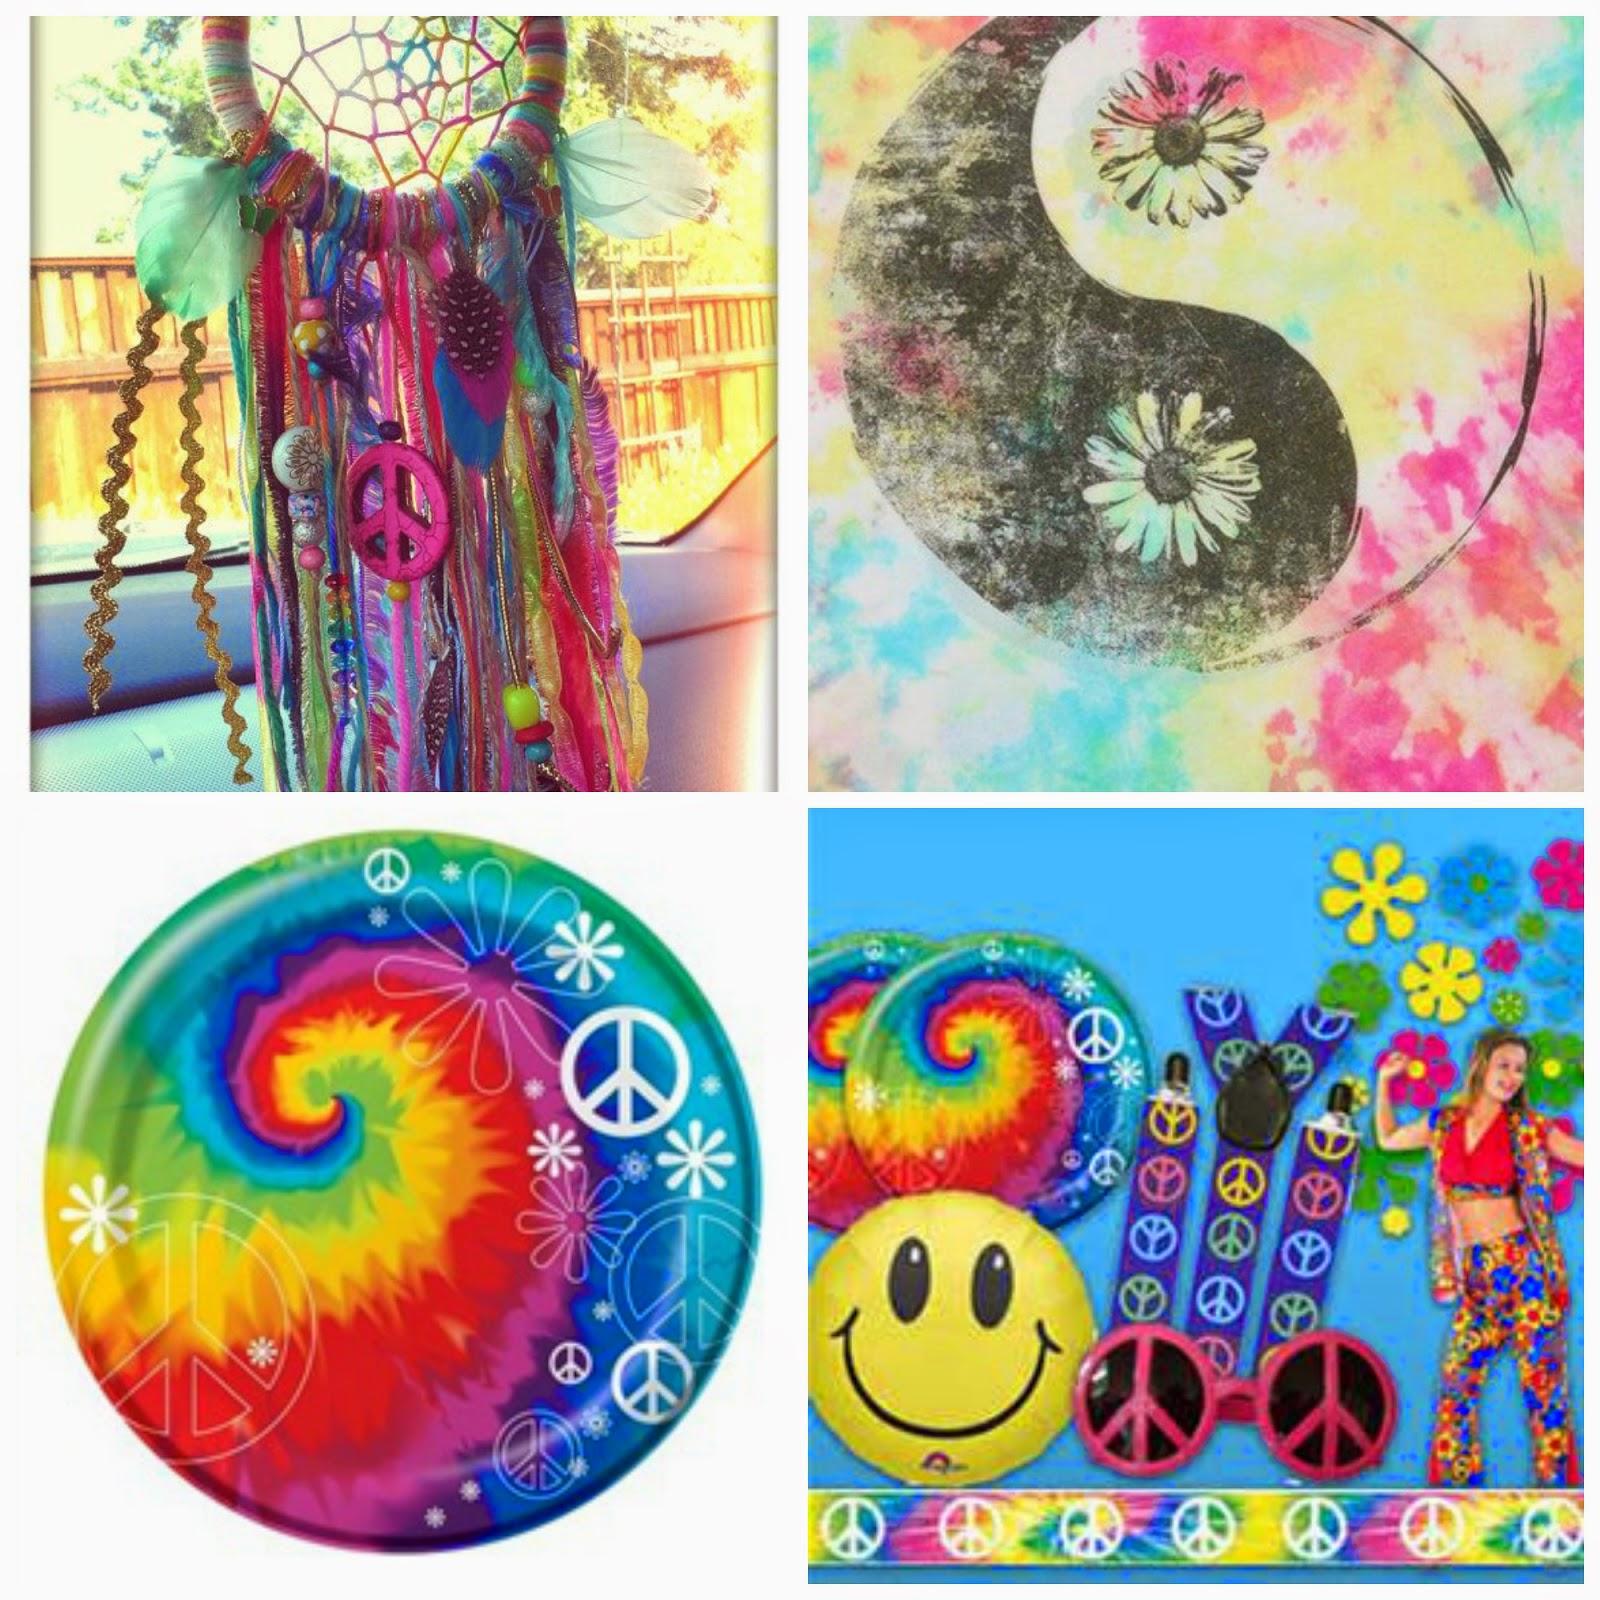 Positiva Creativa Como Decorar Una Fiesta Hippie - Decoracion-hippie-fiesta